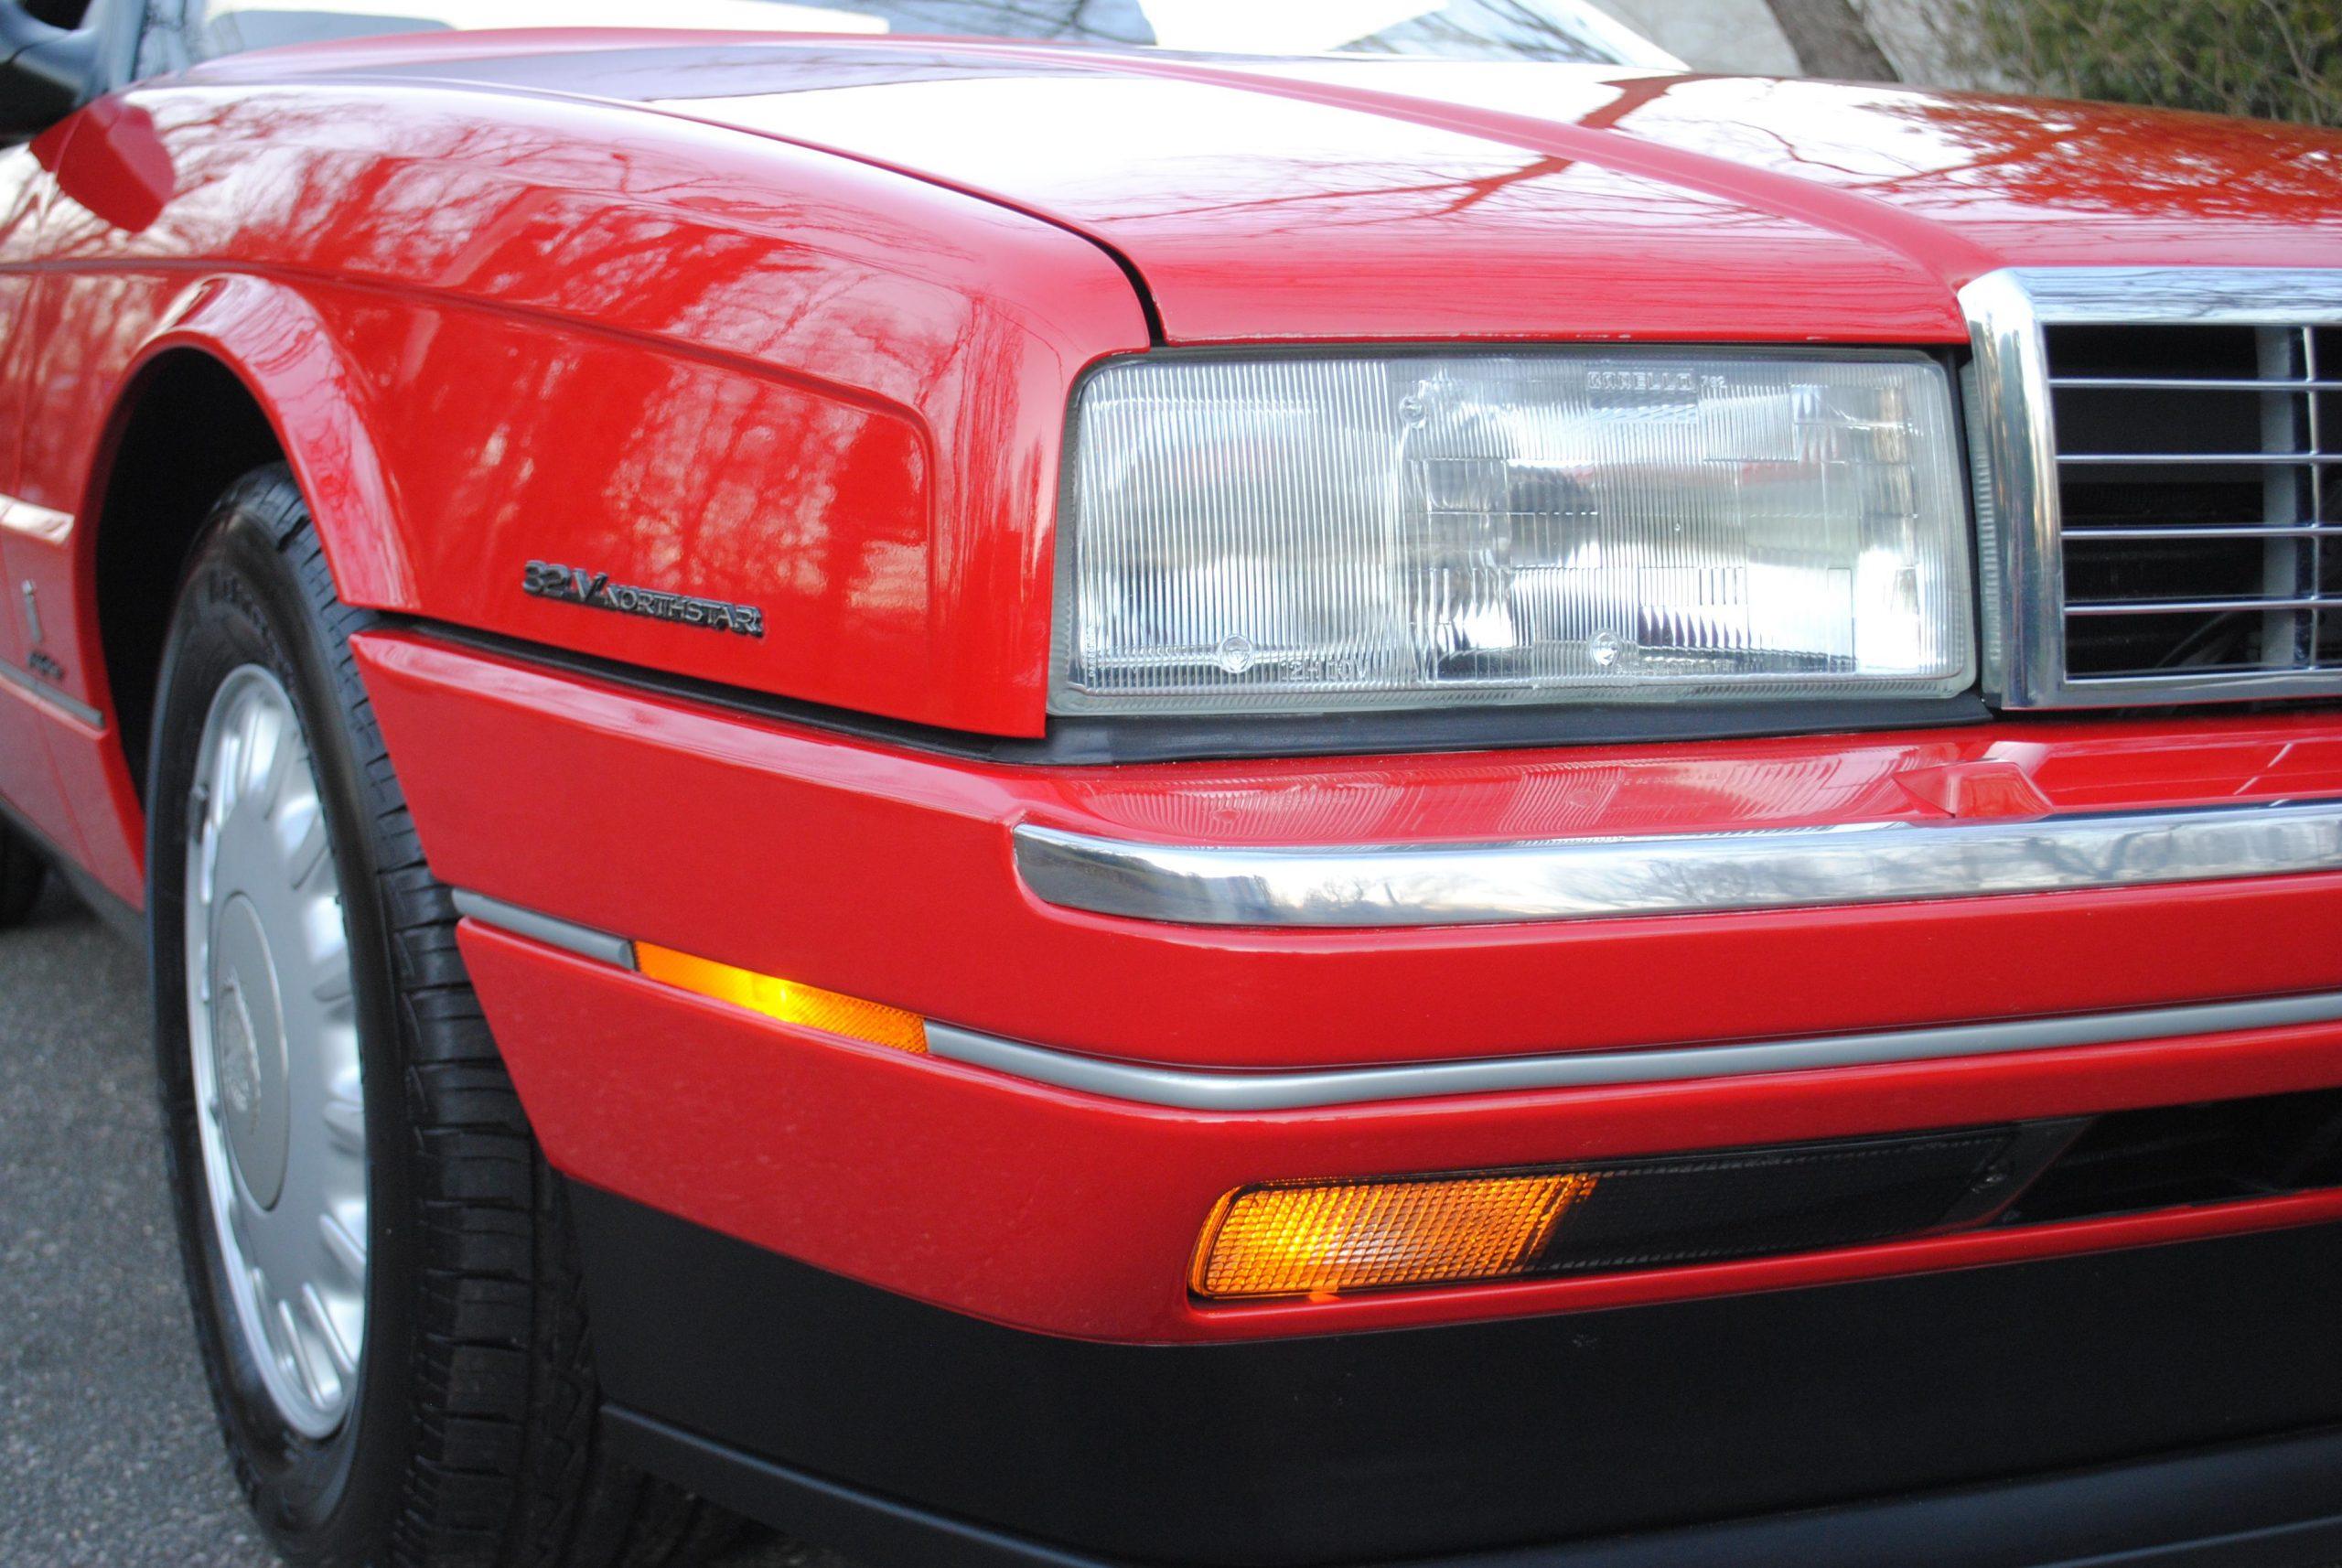 1993 Cadillac Allante headlight